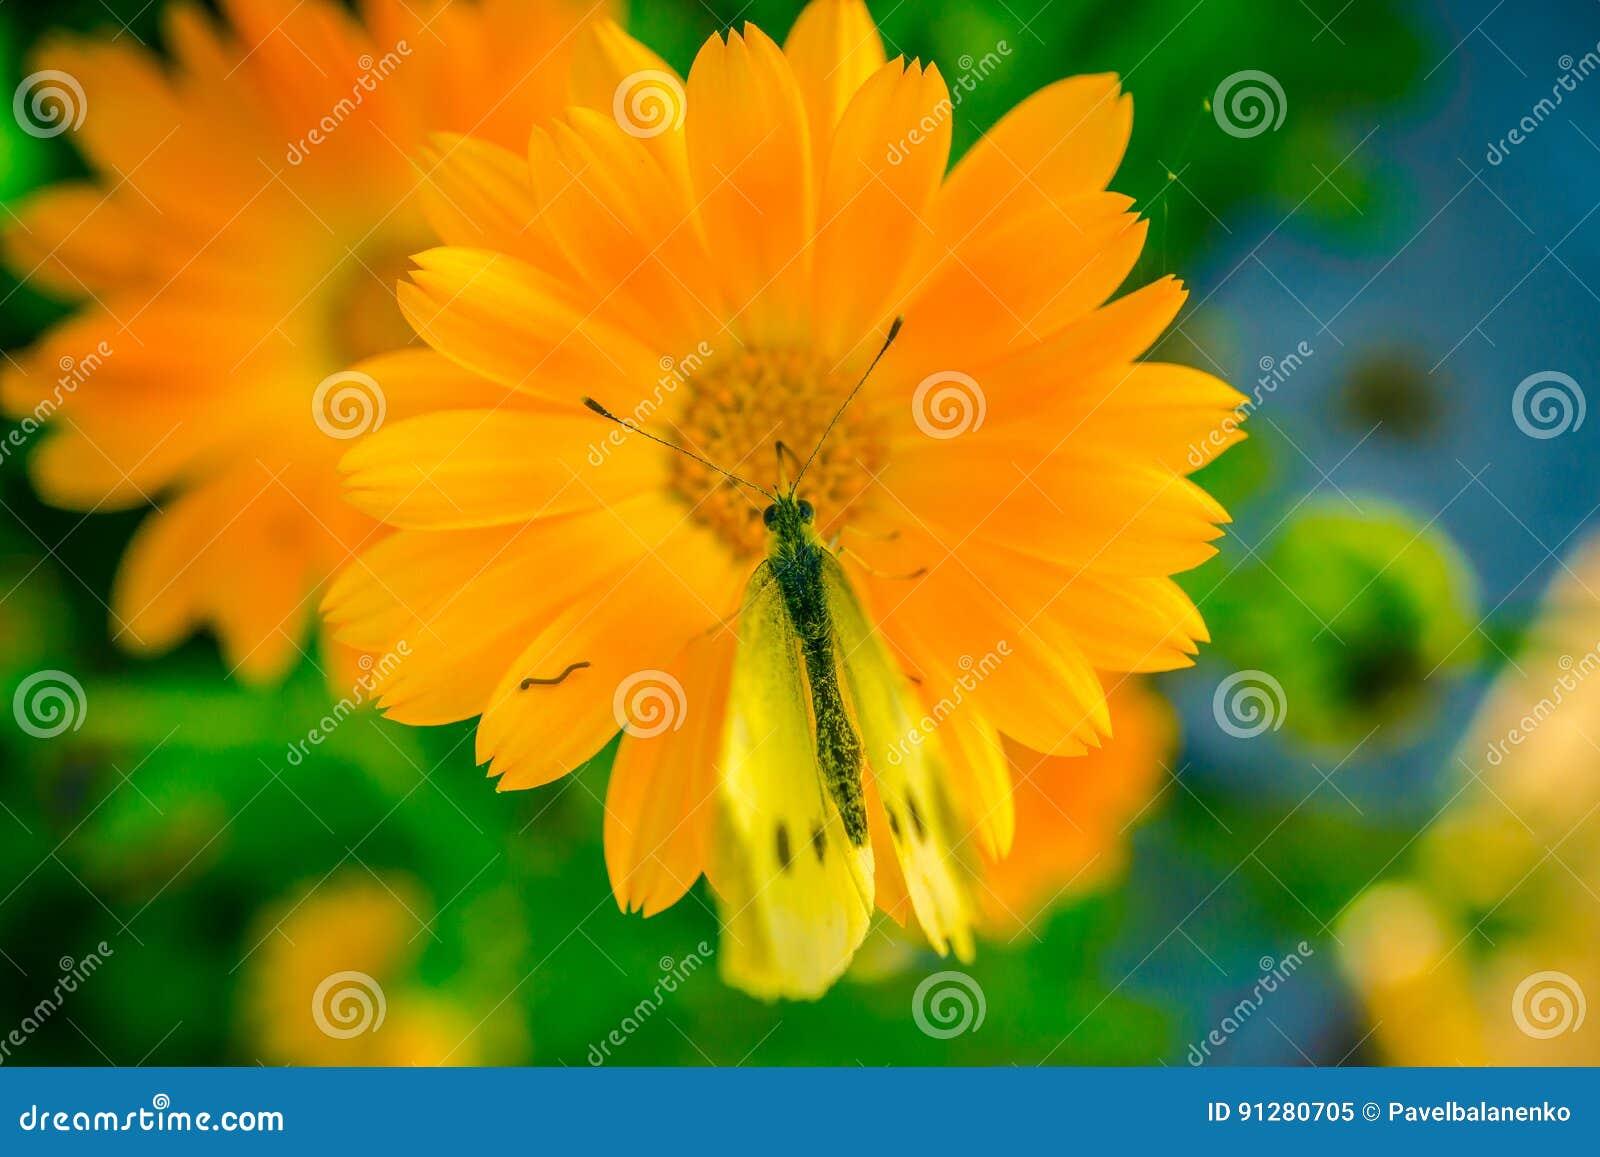 Gul fjäril på den orange blomman